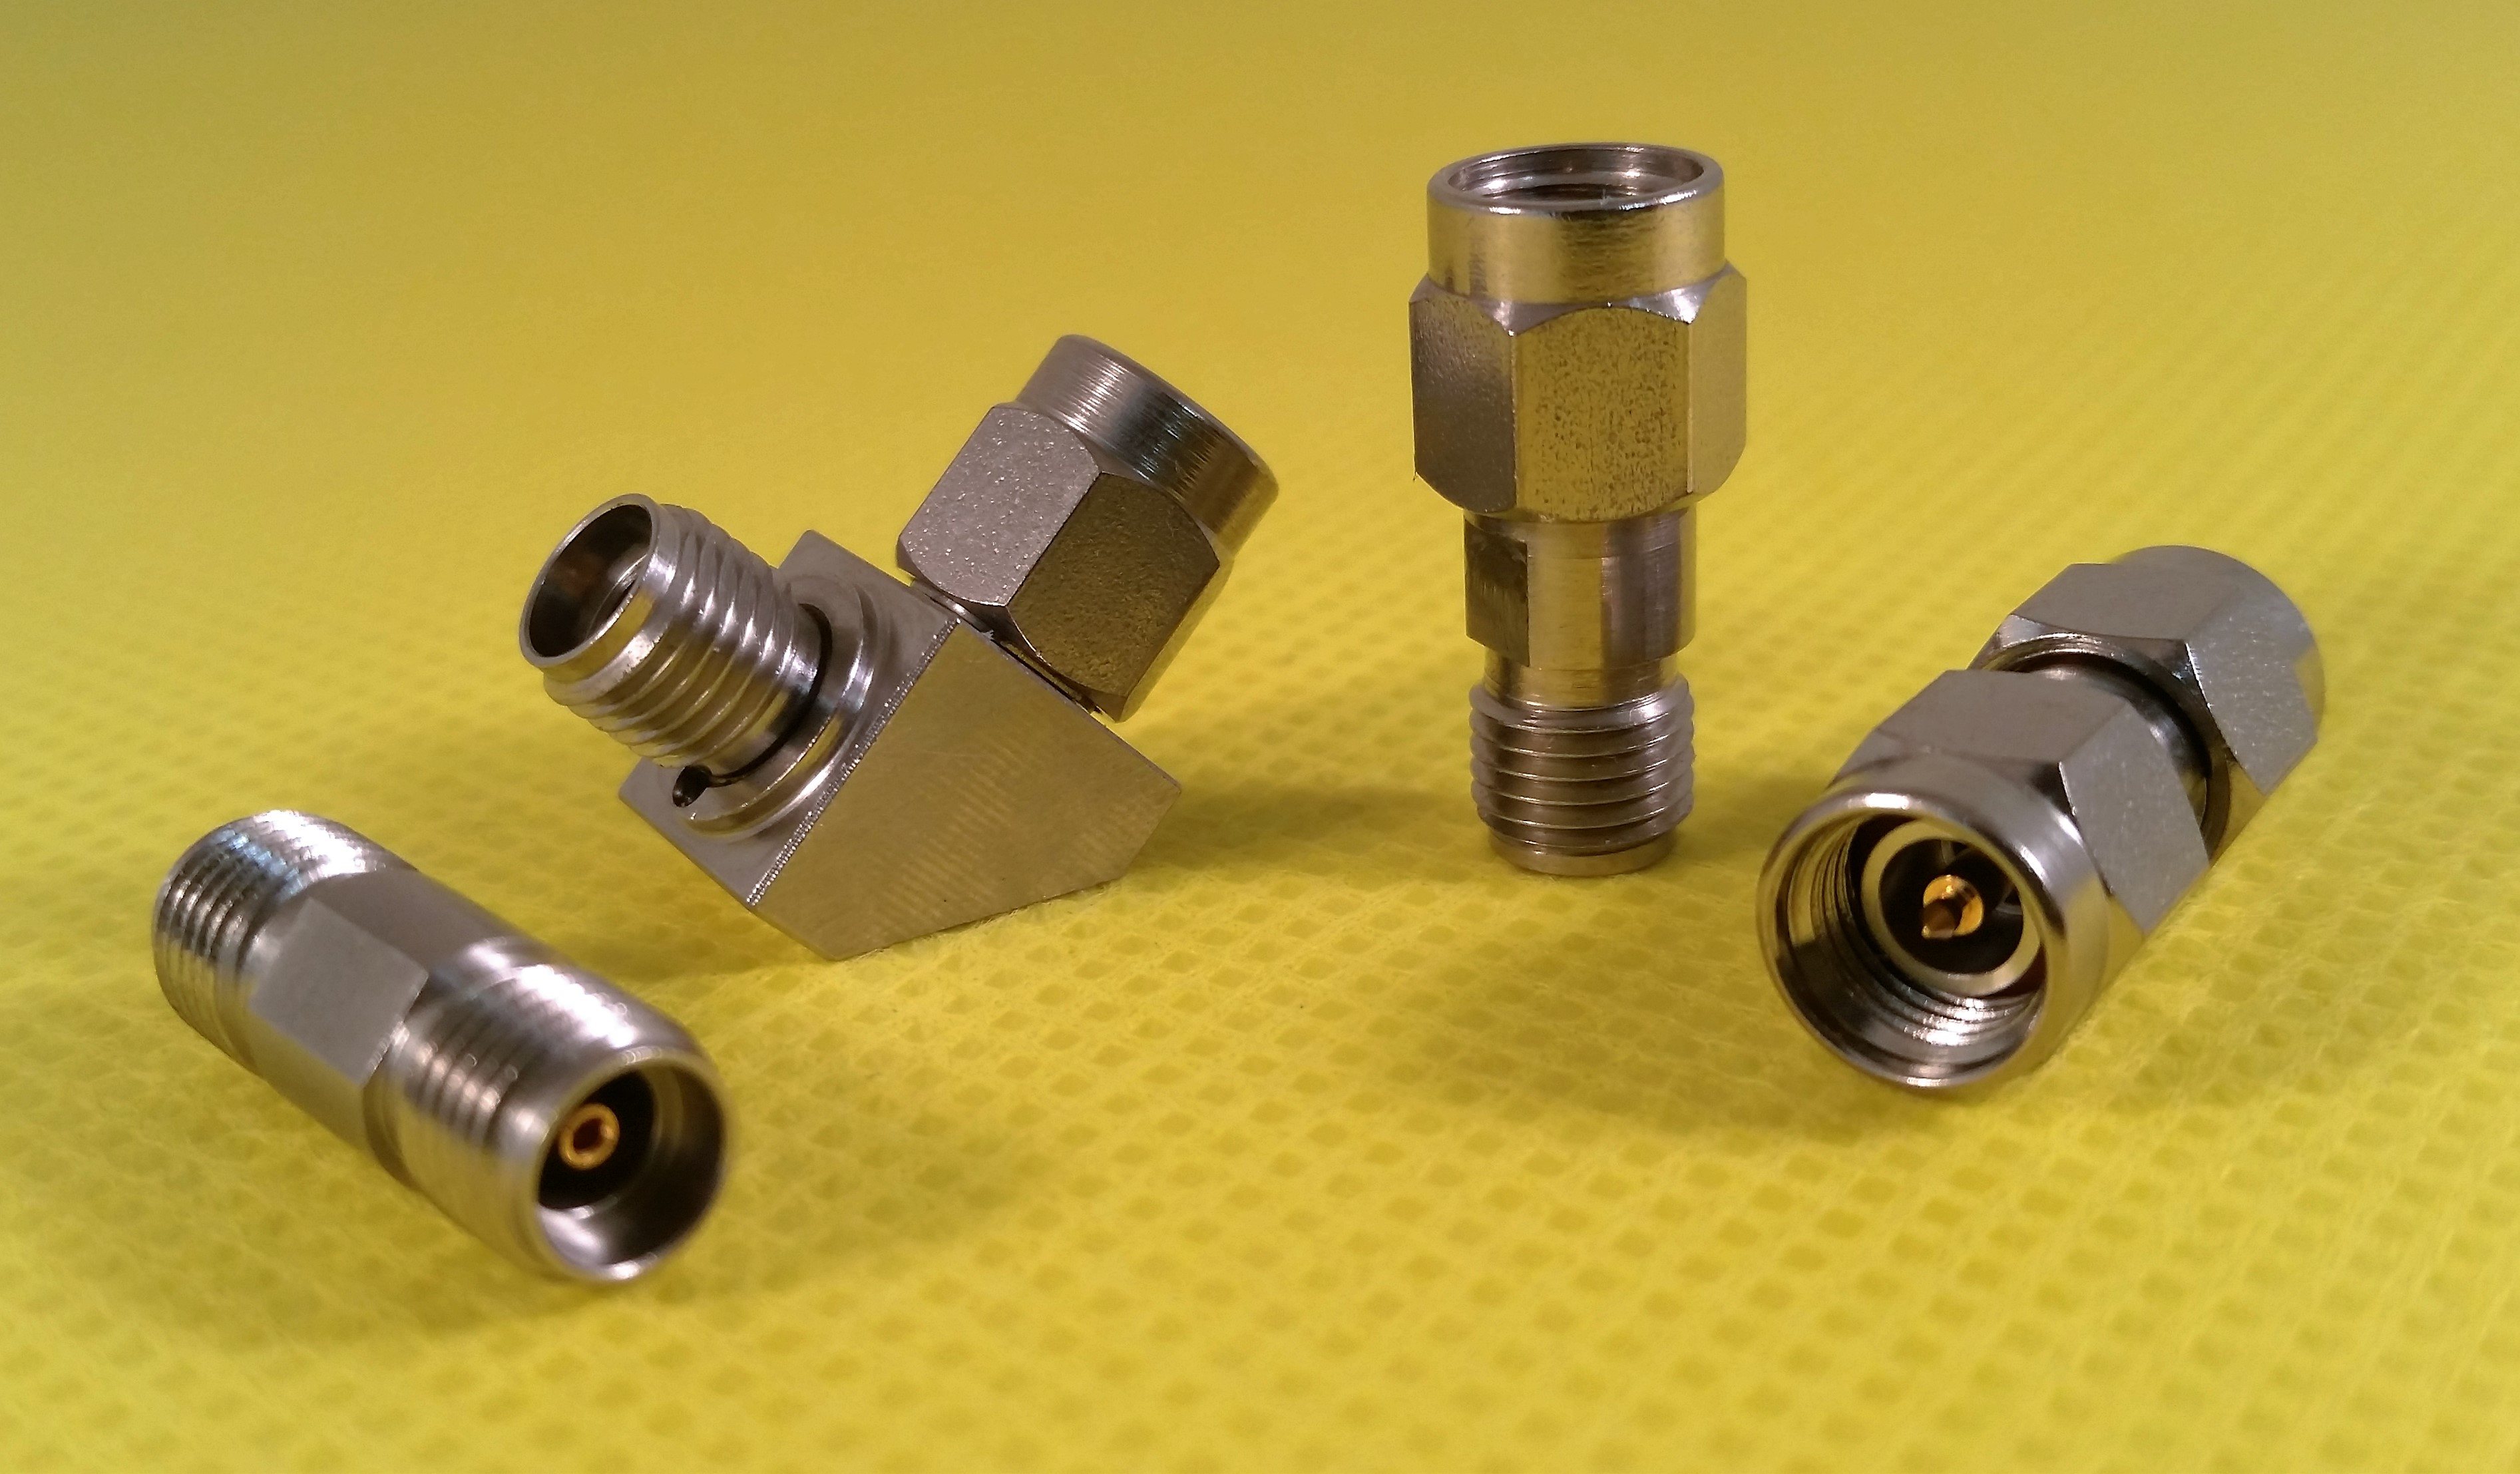 sgmc-microwave-3.5mm-adapters.jpg